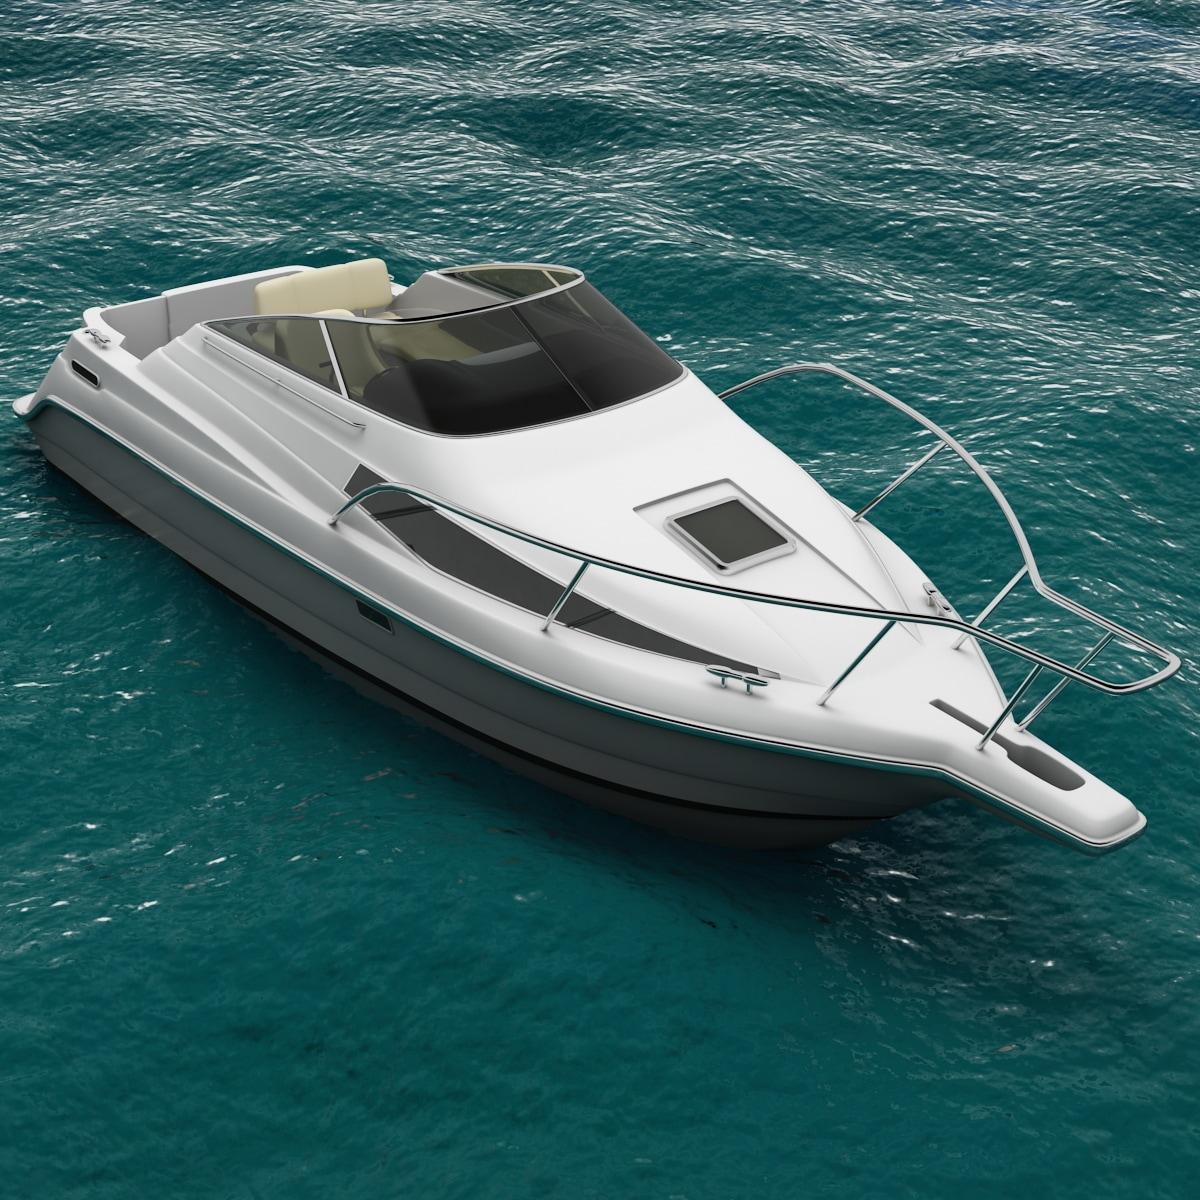 Boat_Bayliner_Cierra_2655_Vray_1.jpg